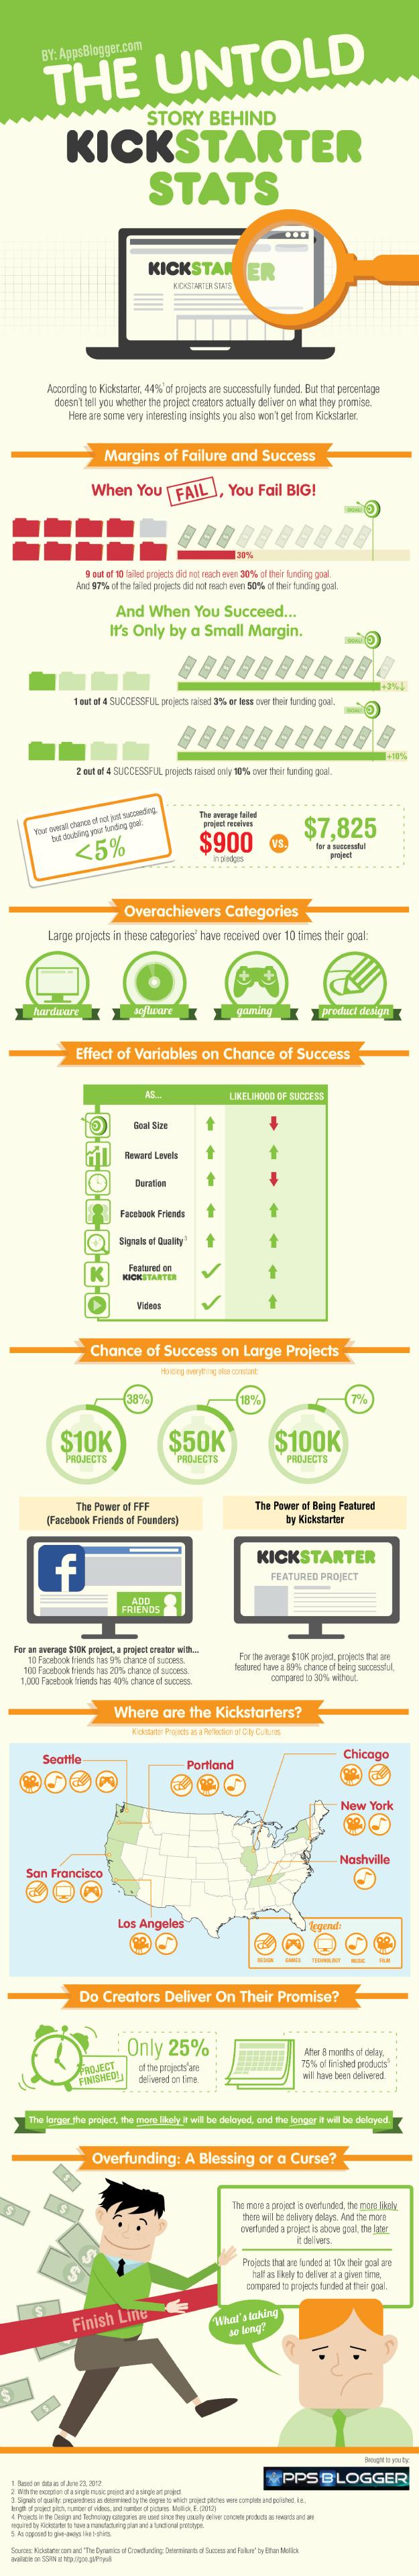 Kickstarter-infographic-625